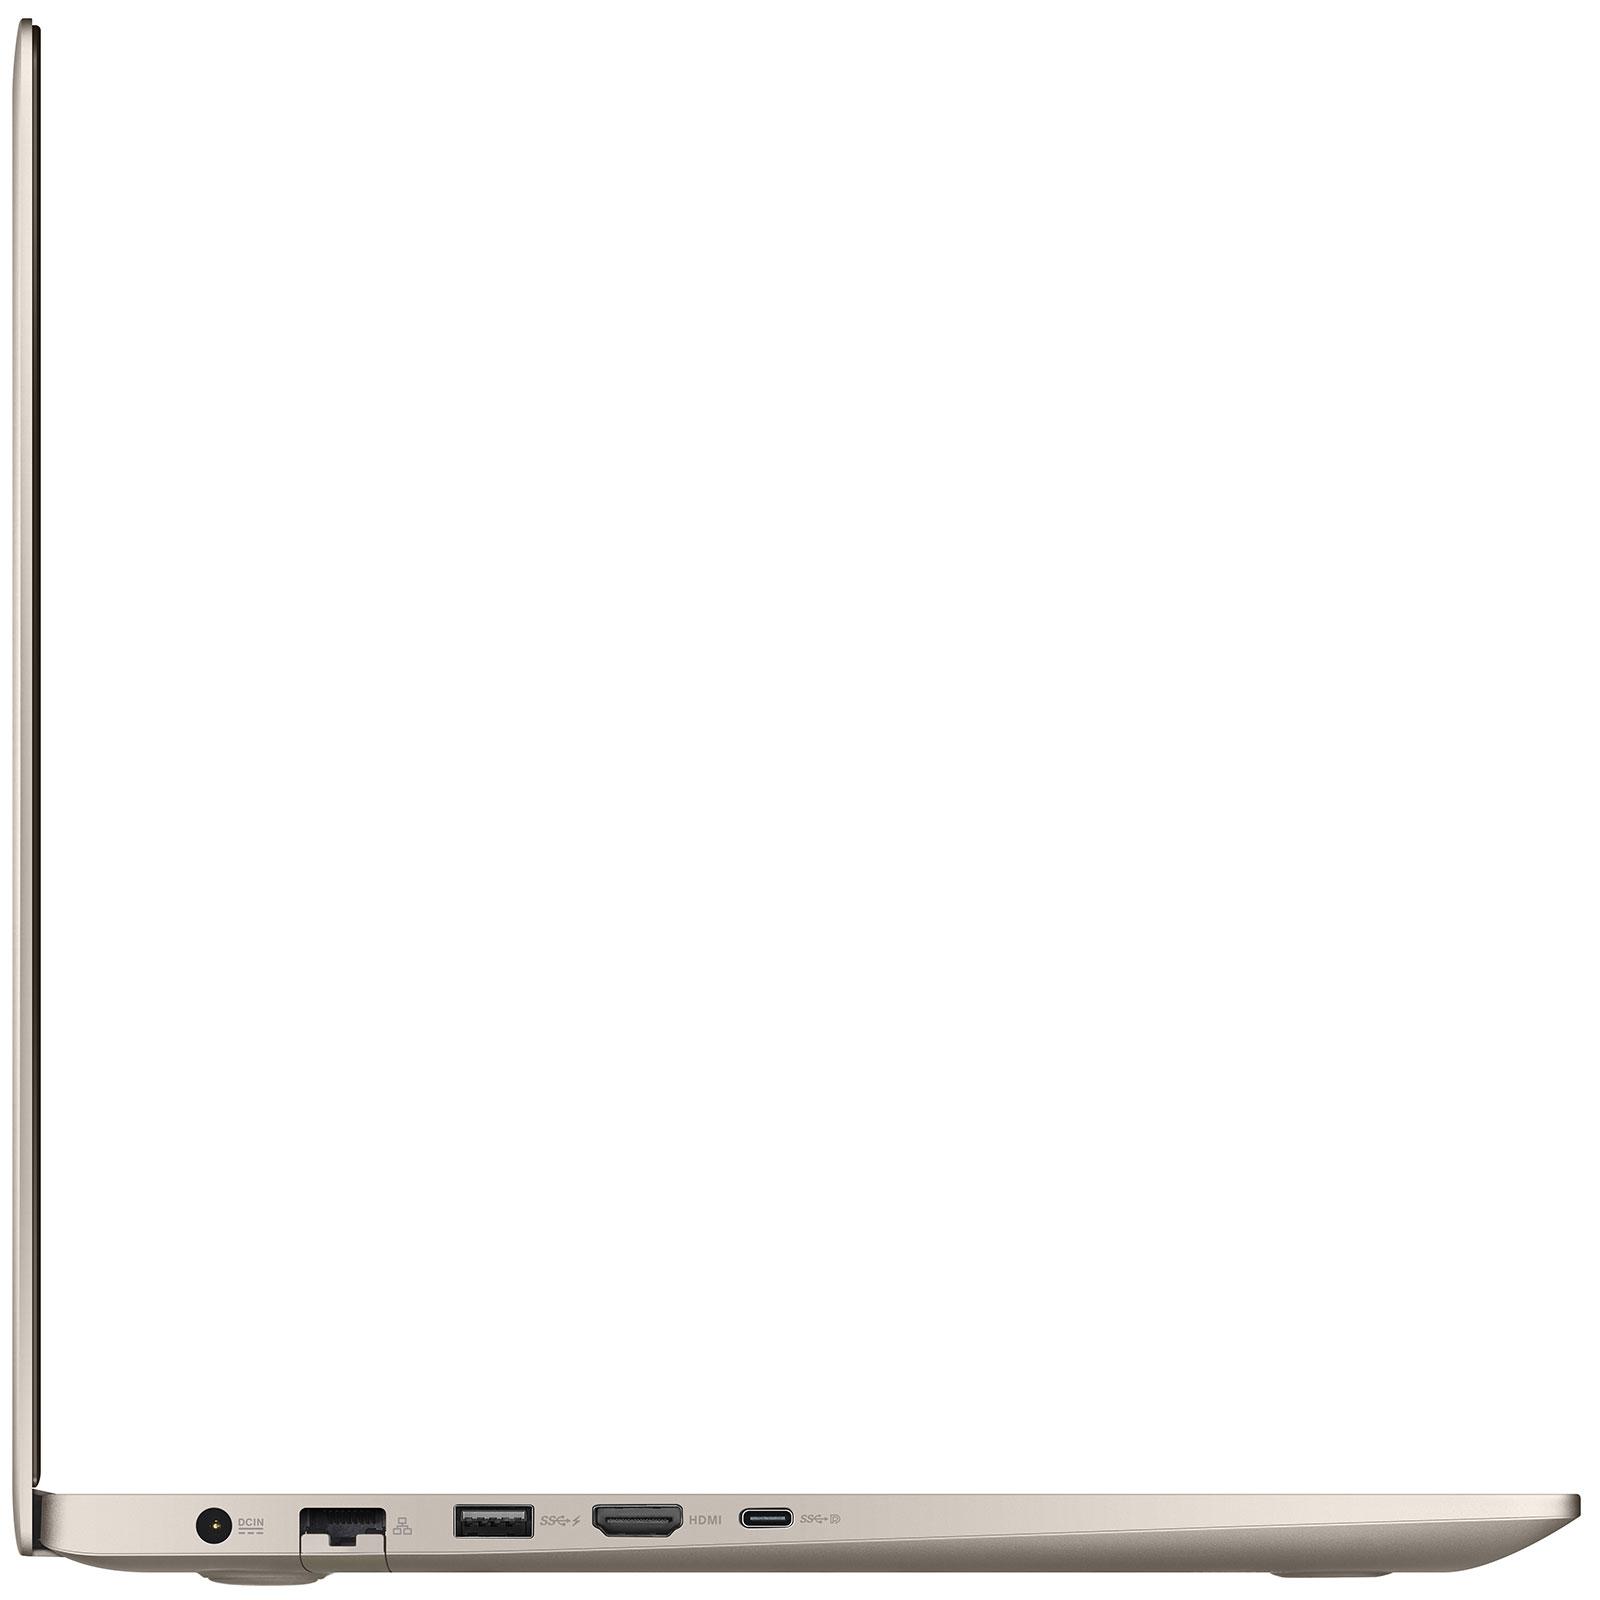 Asus NX580VD-FI523R - PC portable Asus - Cybertek.fr - 3